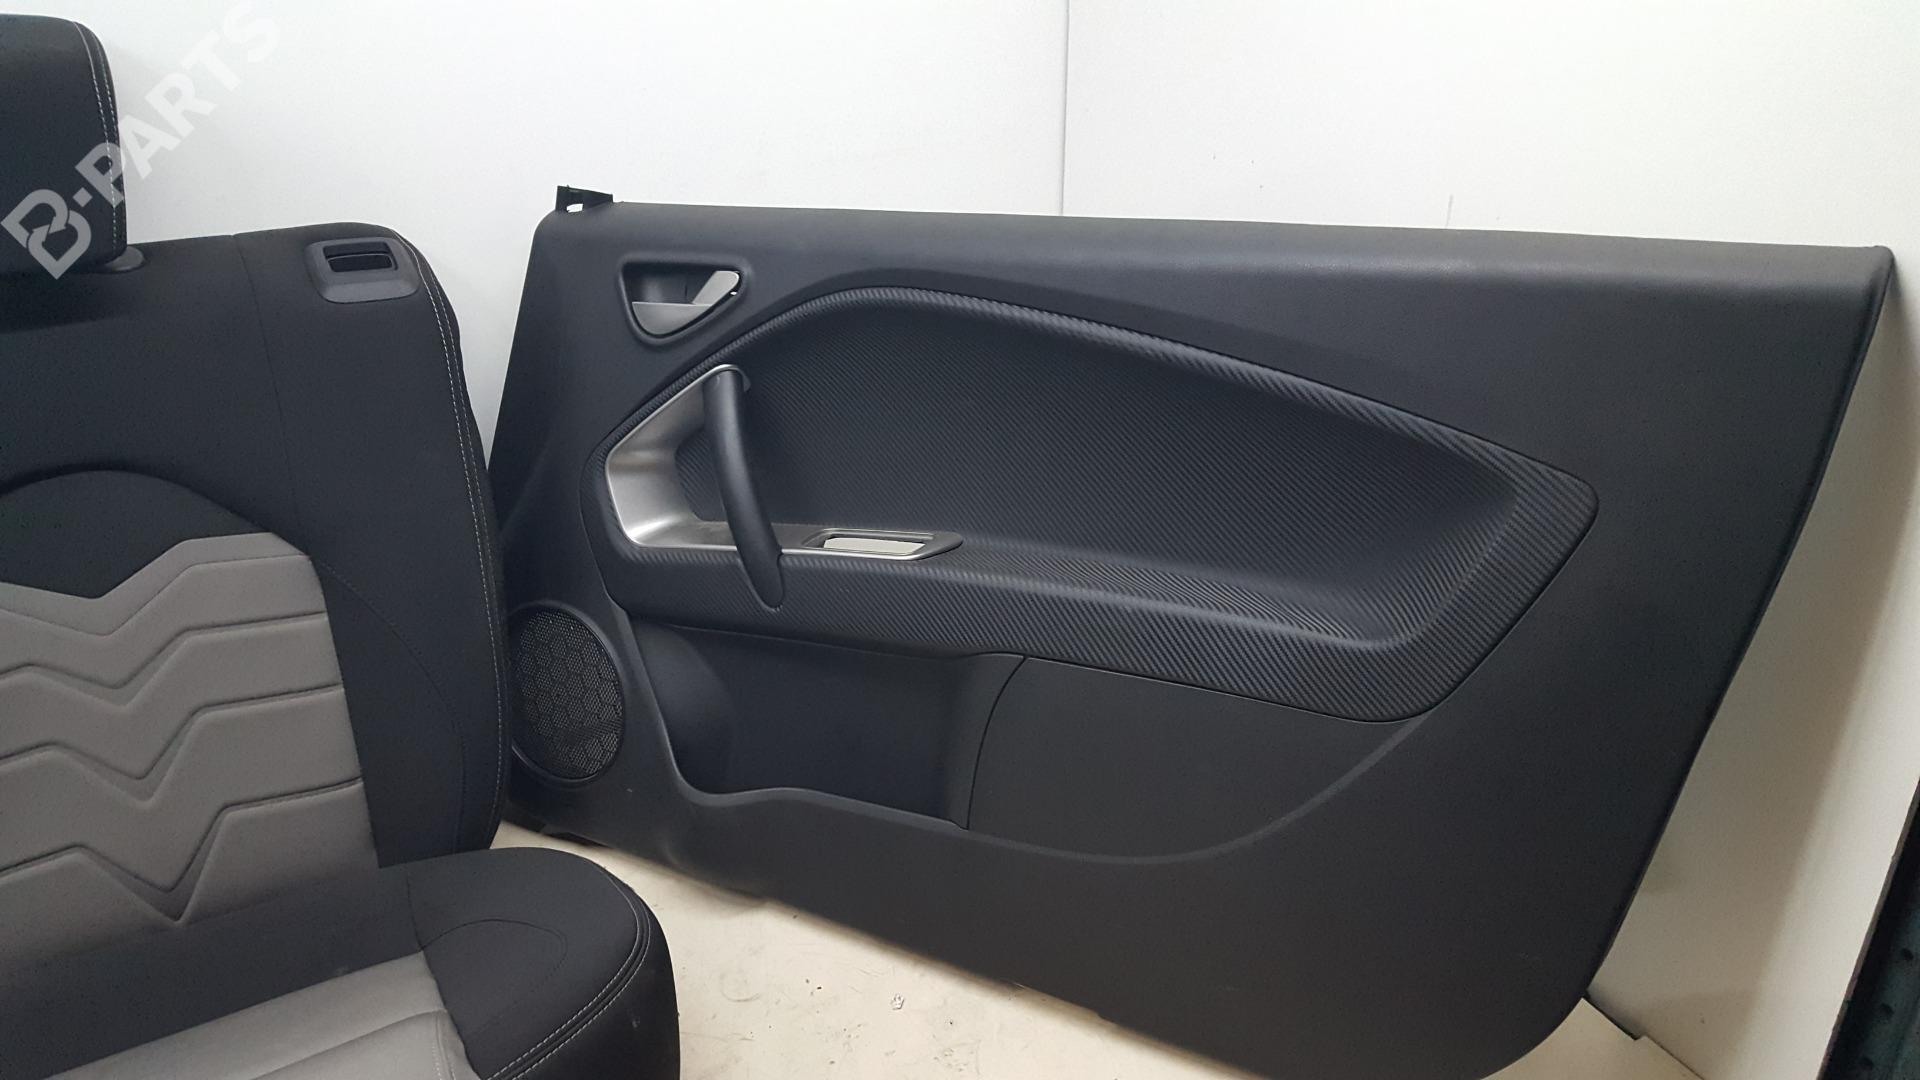 Seats Set Alfa Romeo Mito 955 13 Multijet 1663282 Conjunto De Bancos Forras